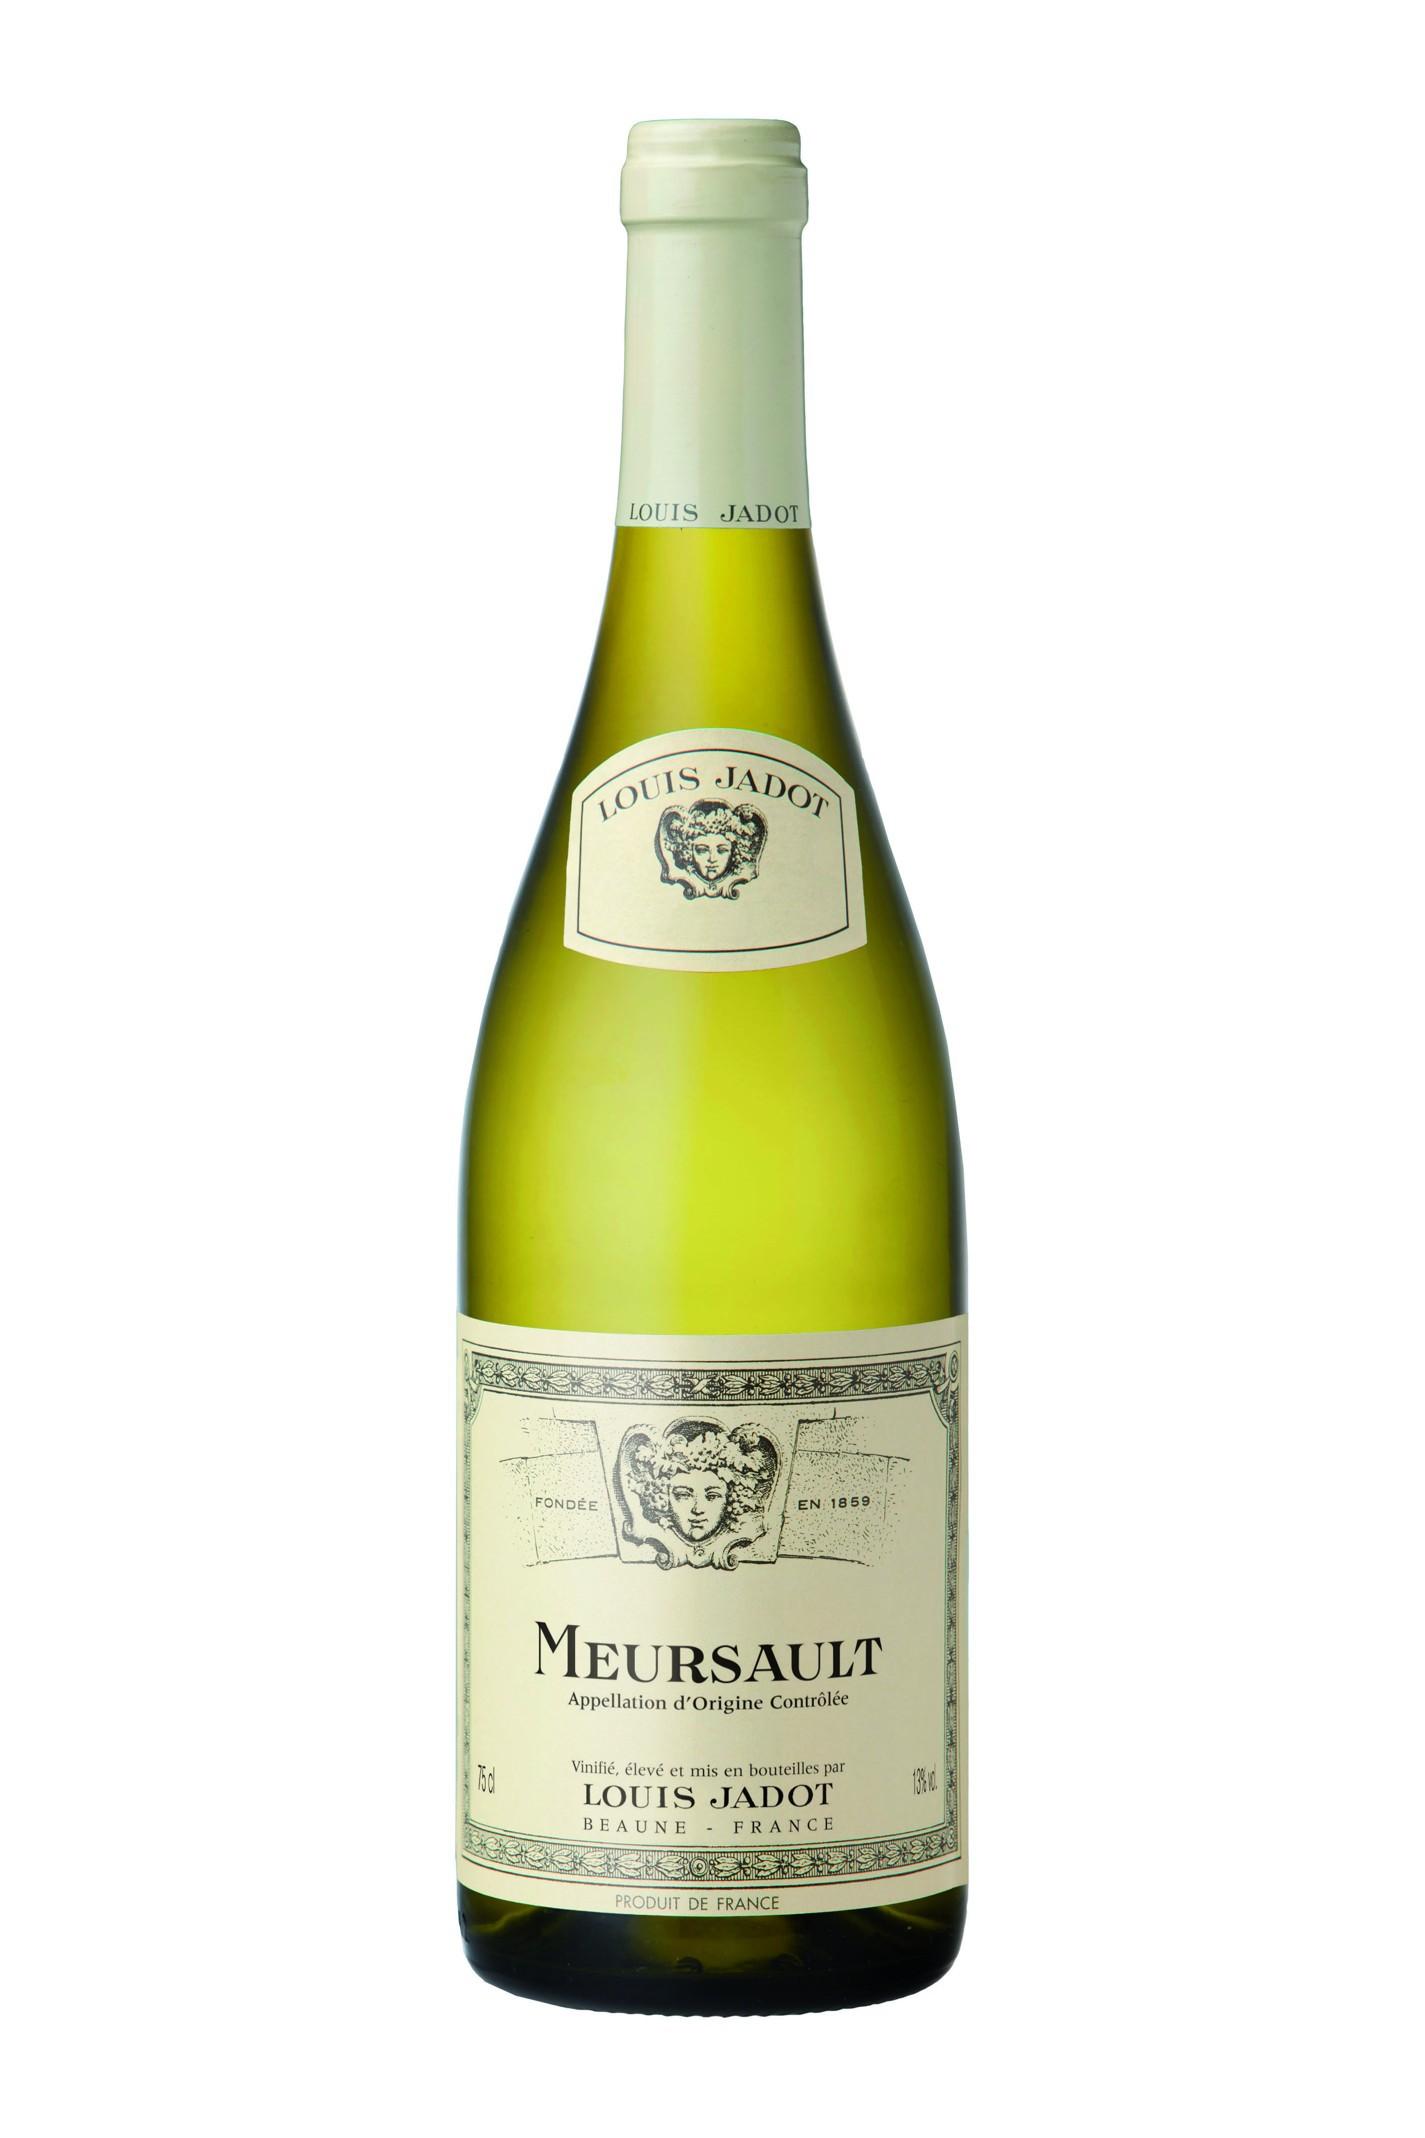 Meursault - Louis Jadot